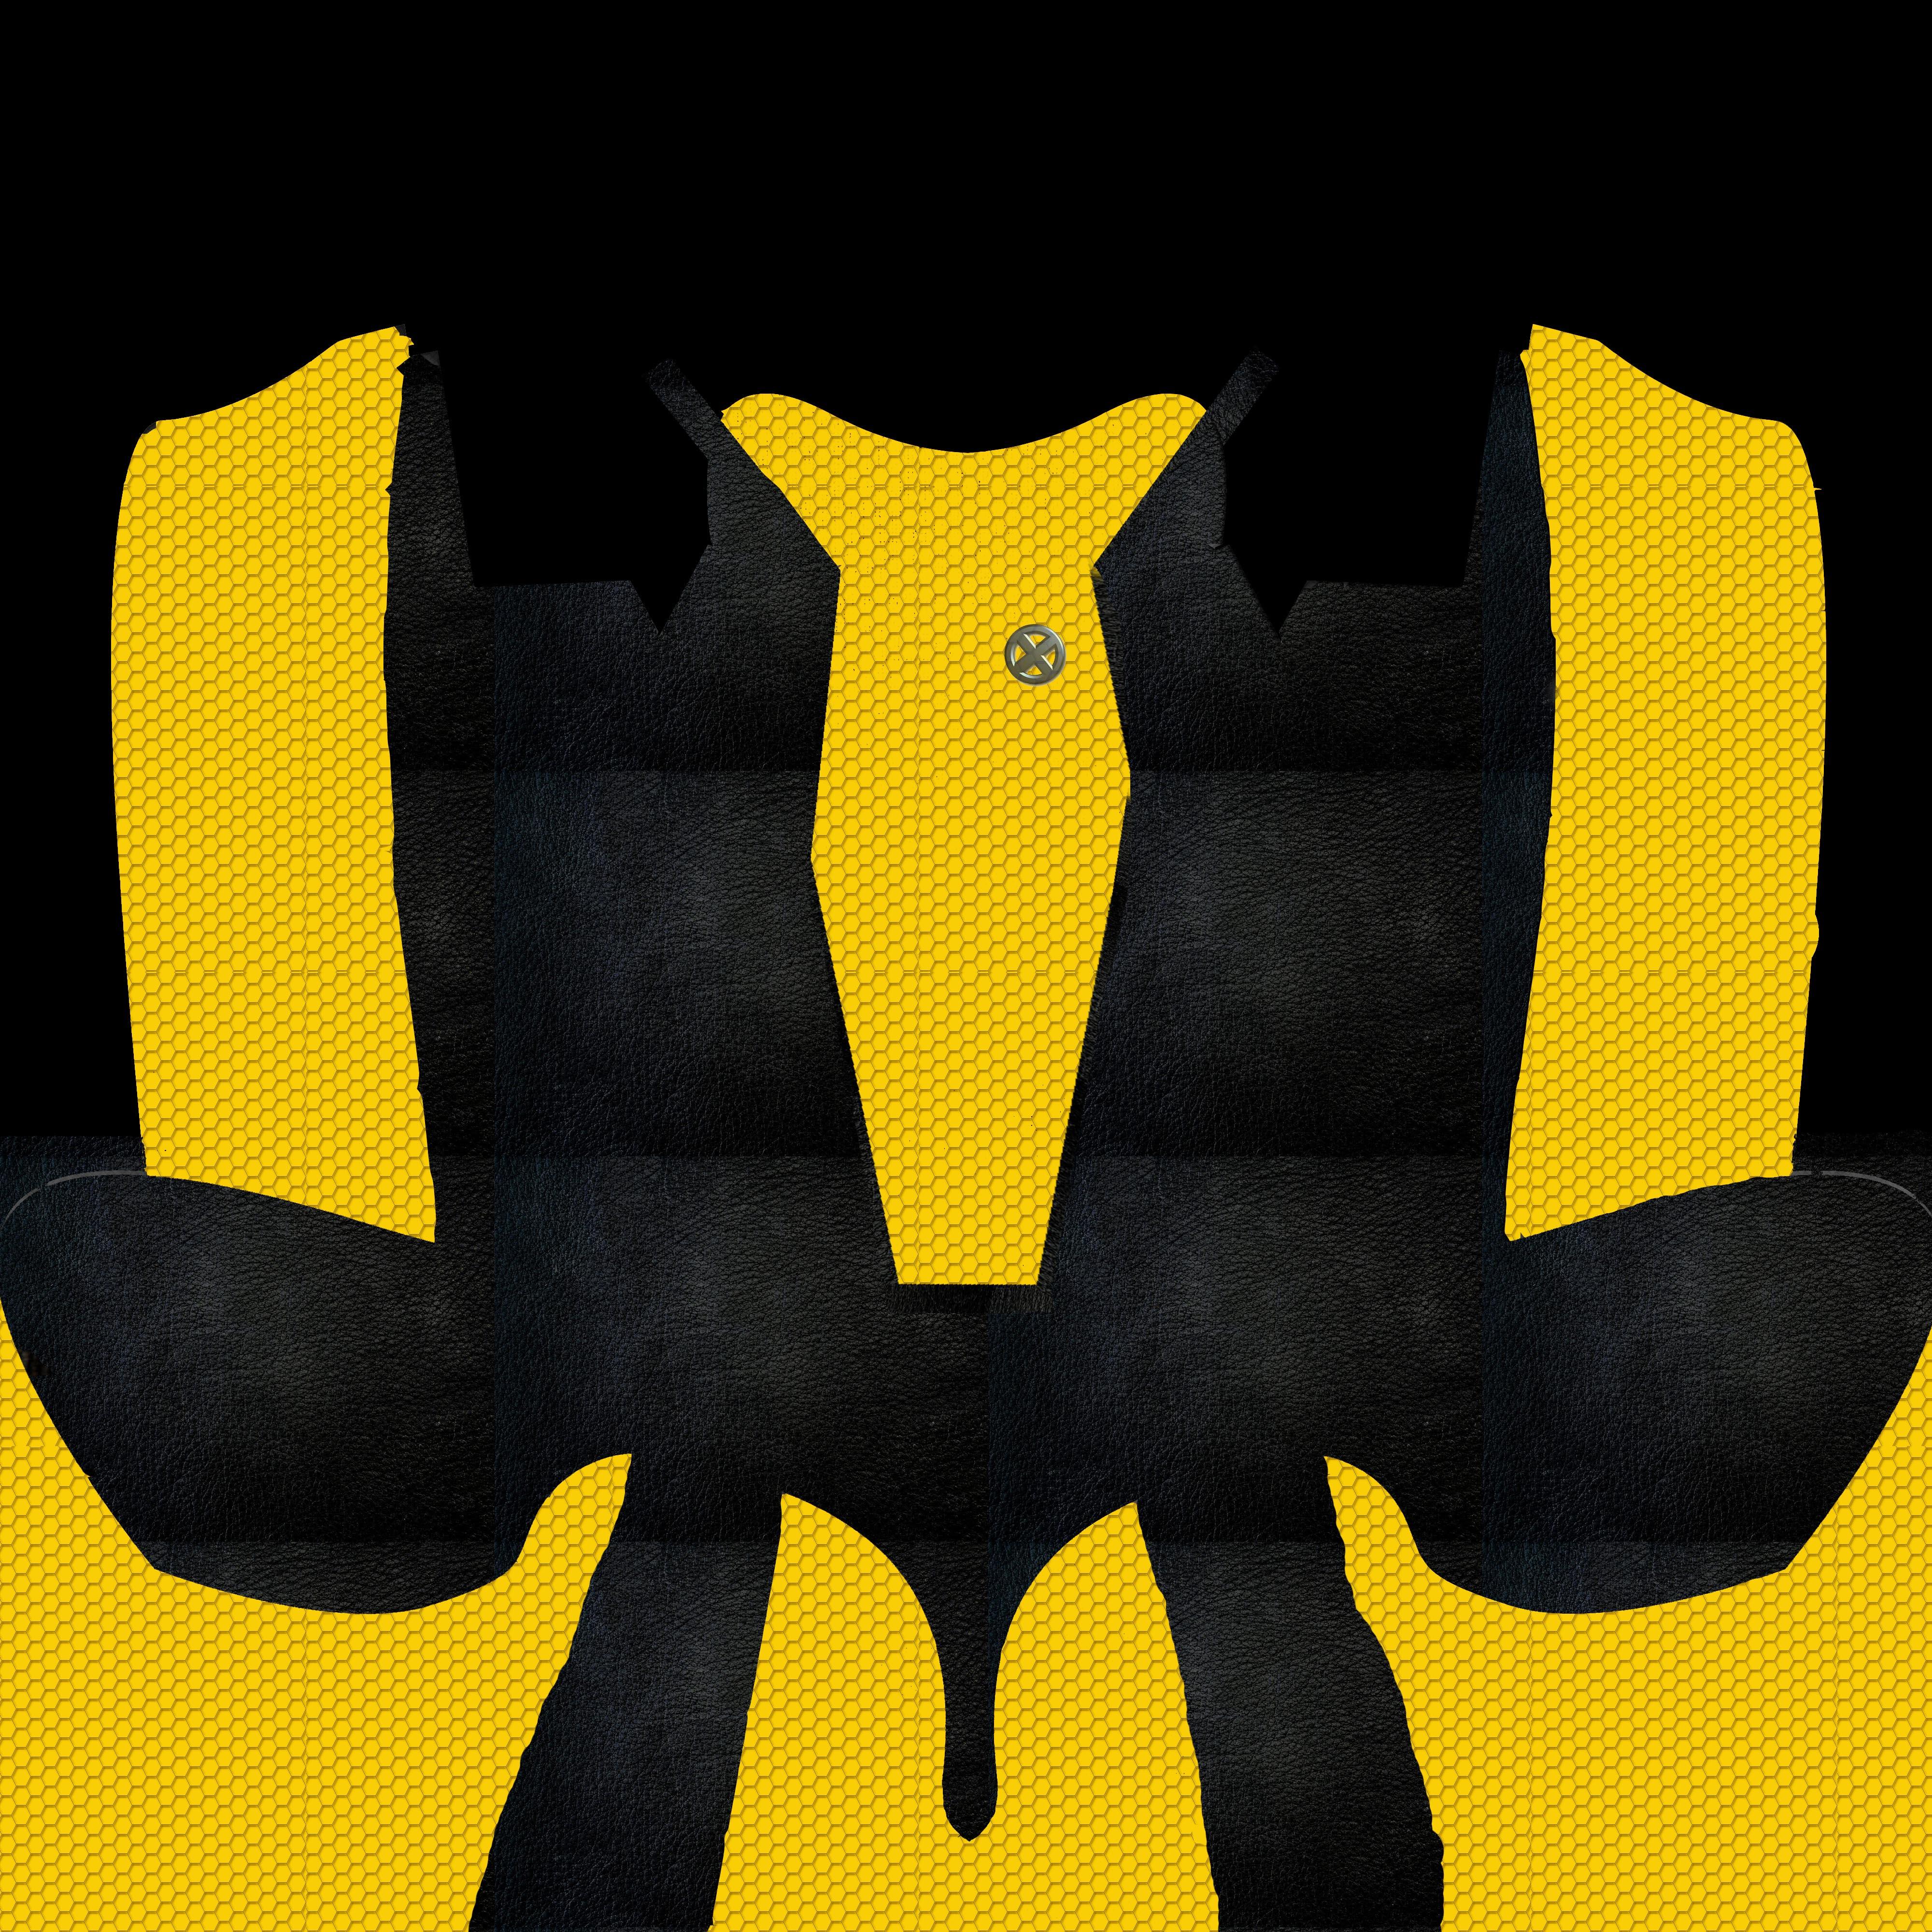 M4 Wolverine Skinbody